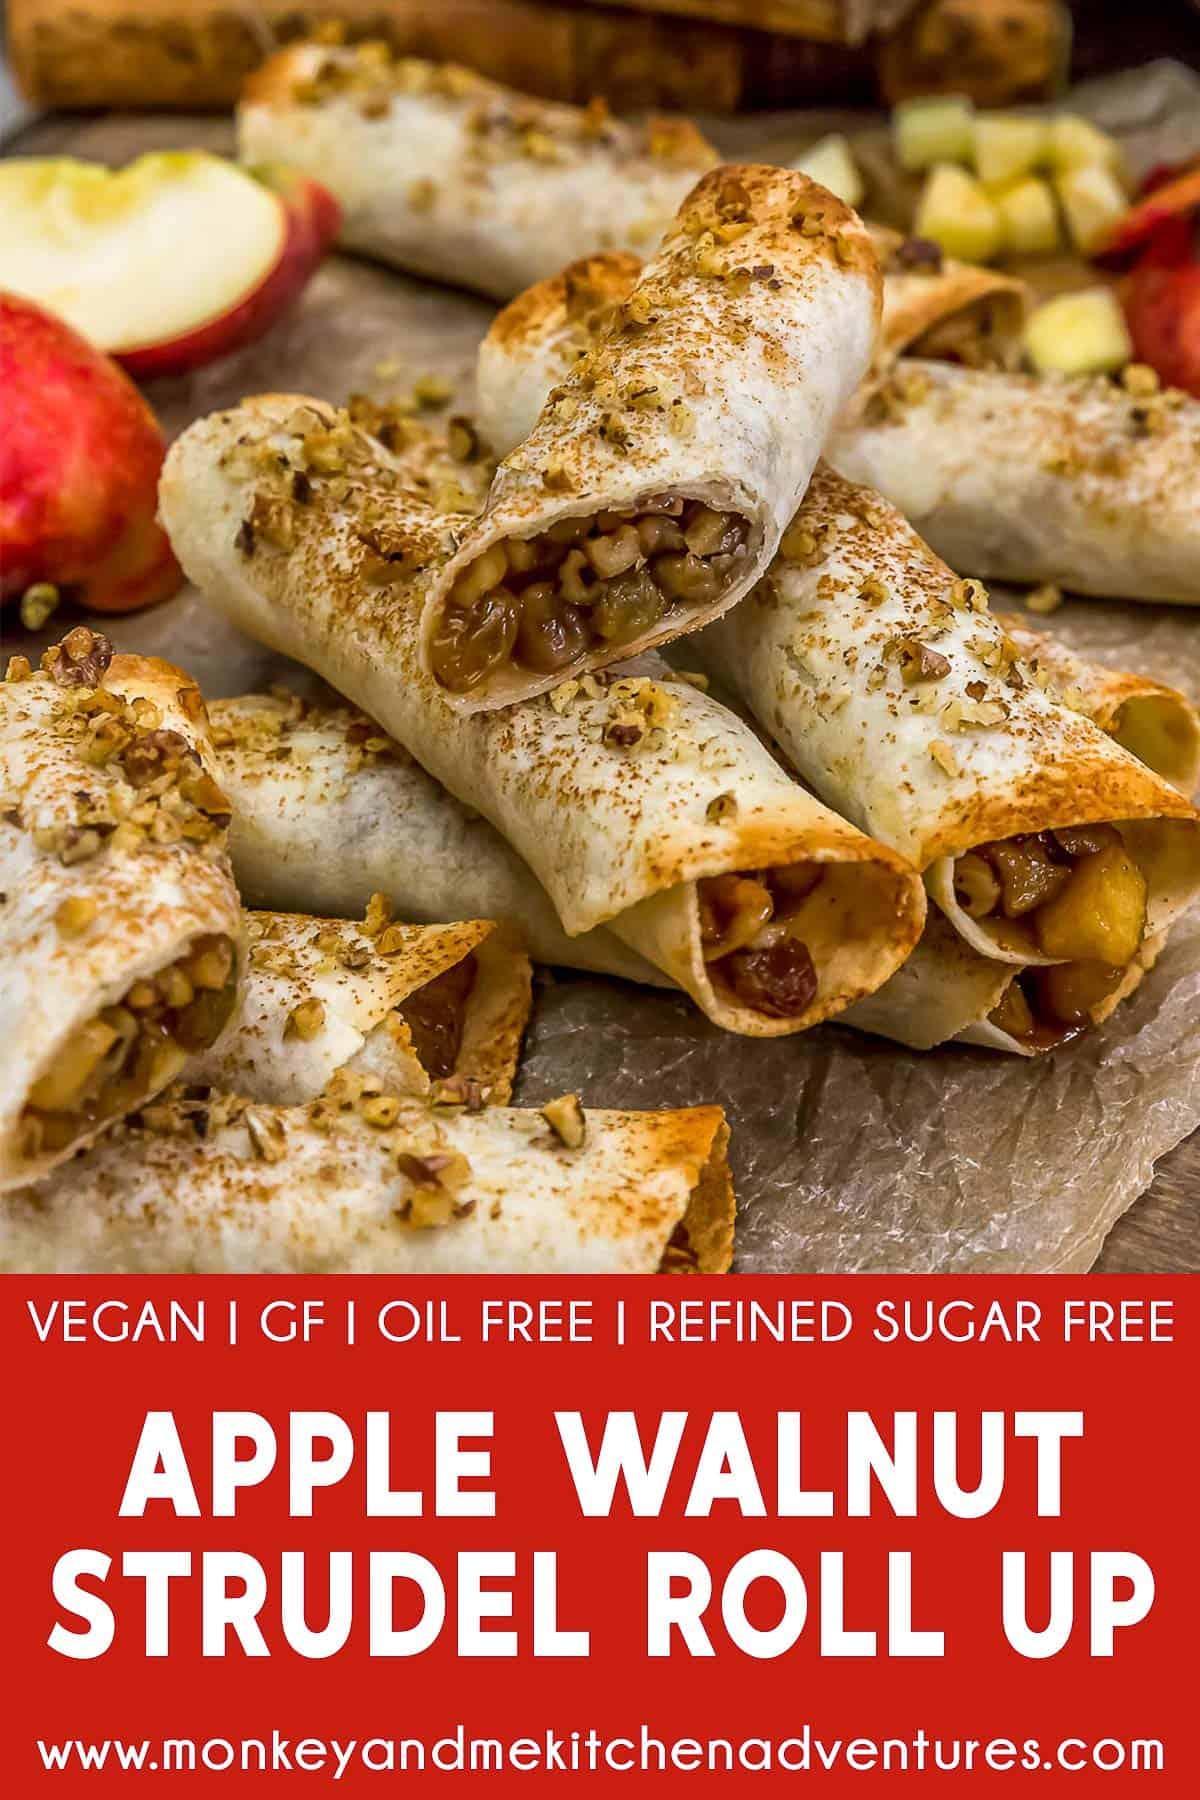 Apple Walnut Strudel Roll-Ups with Text Description